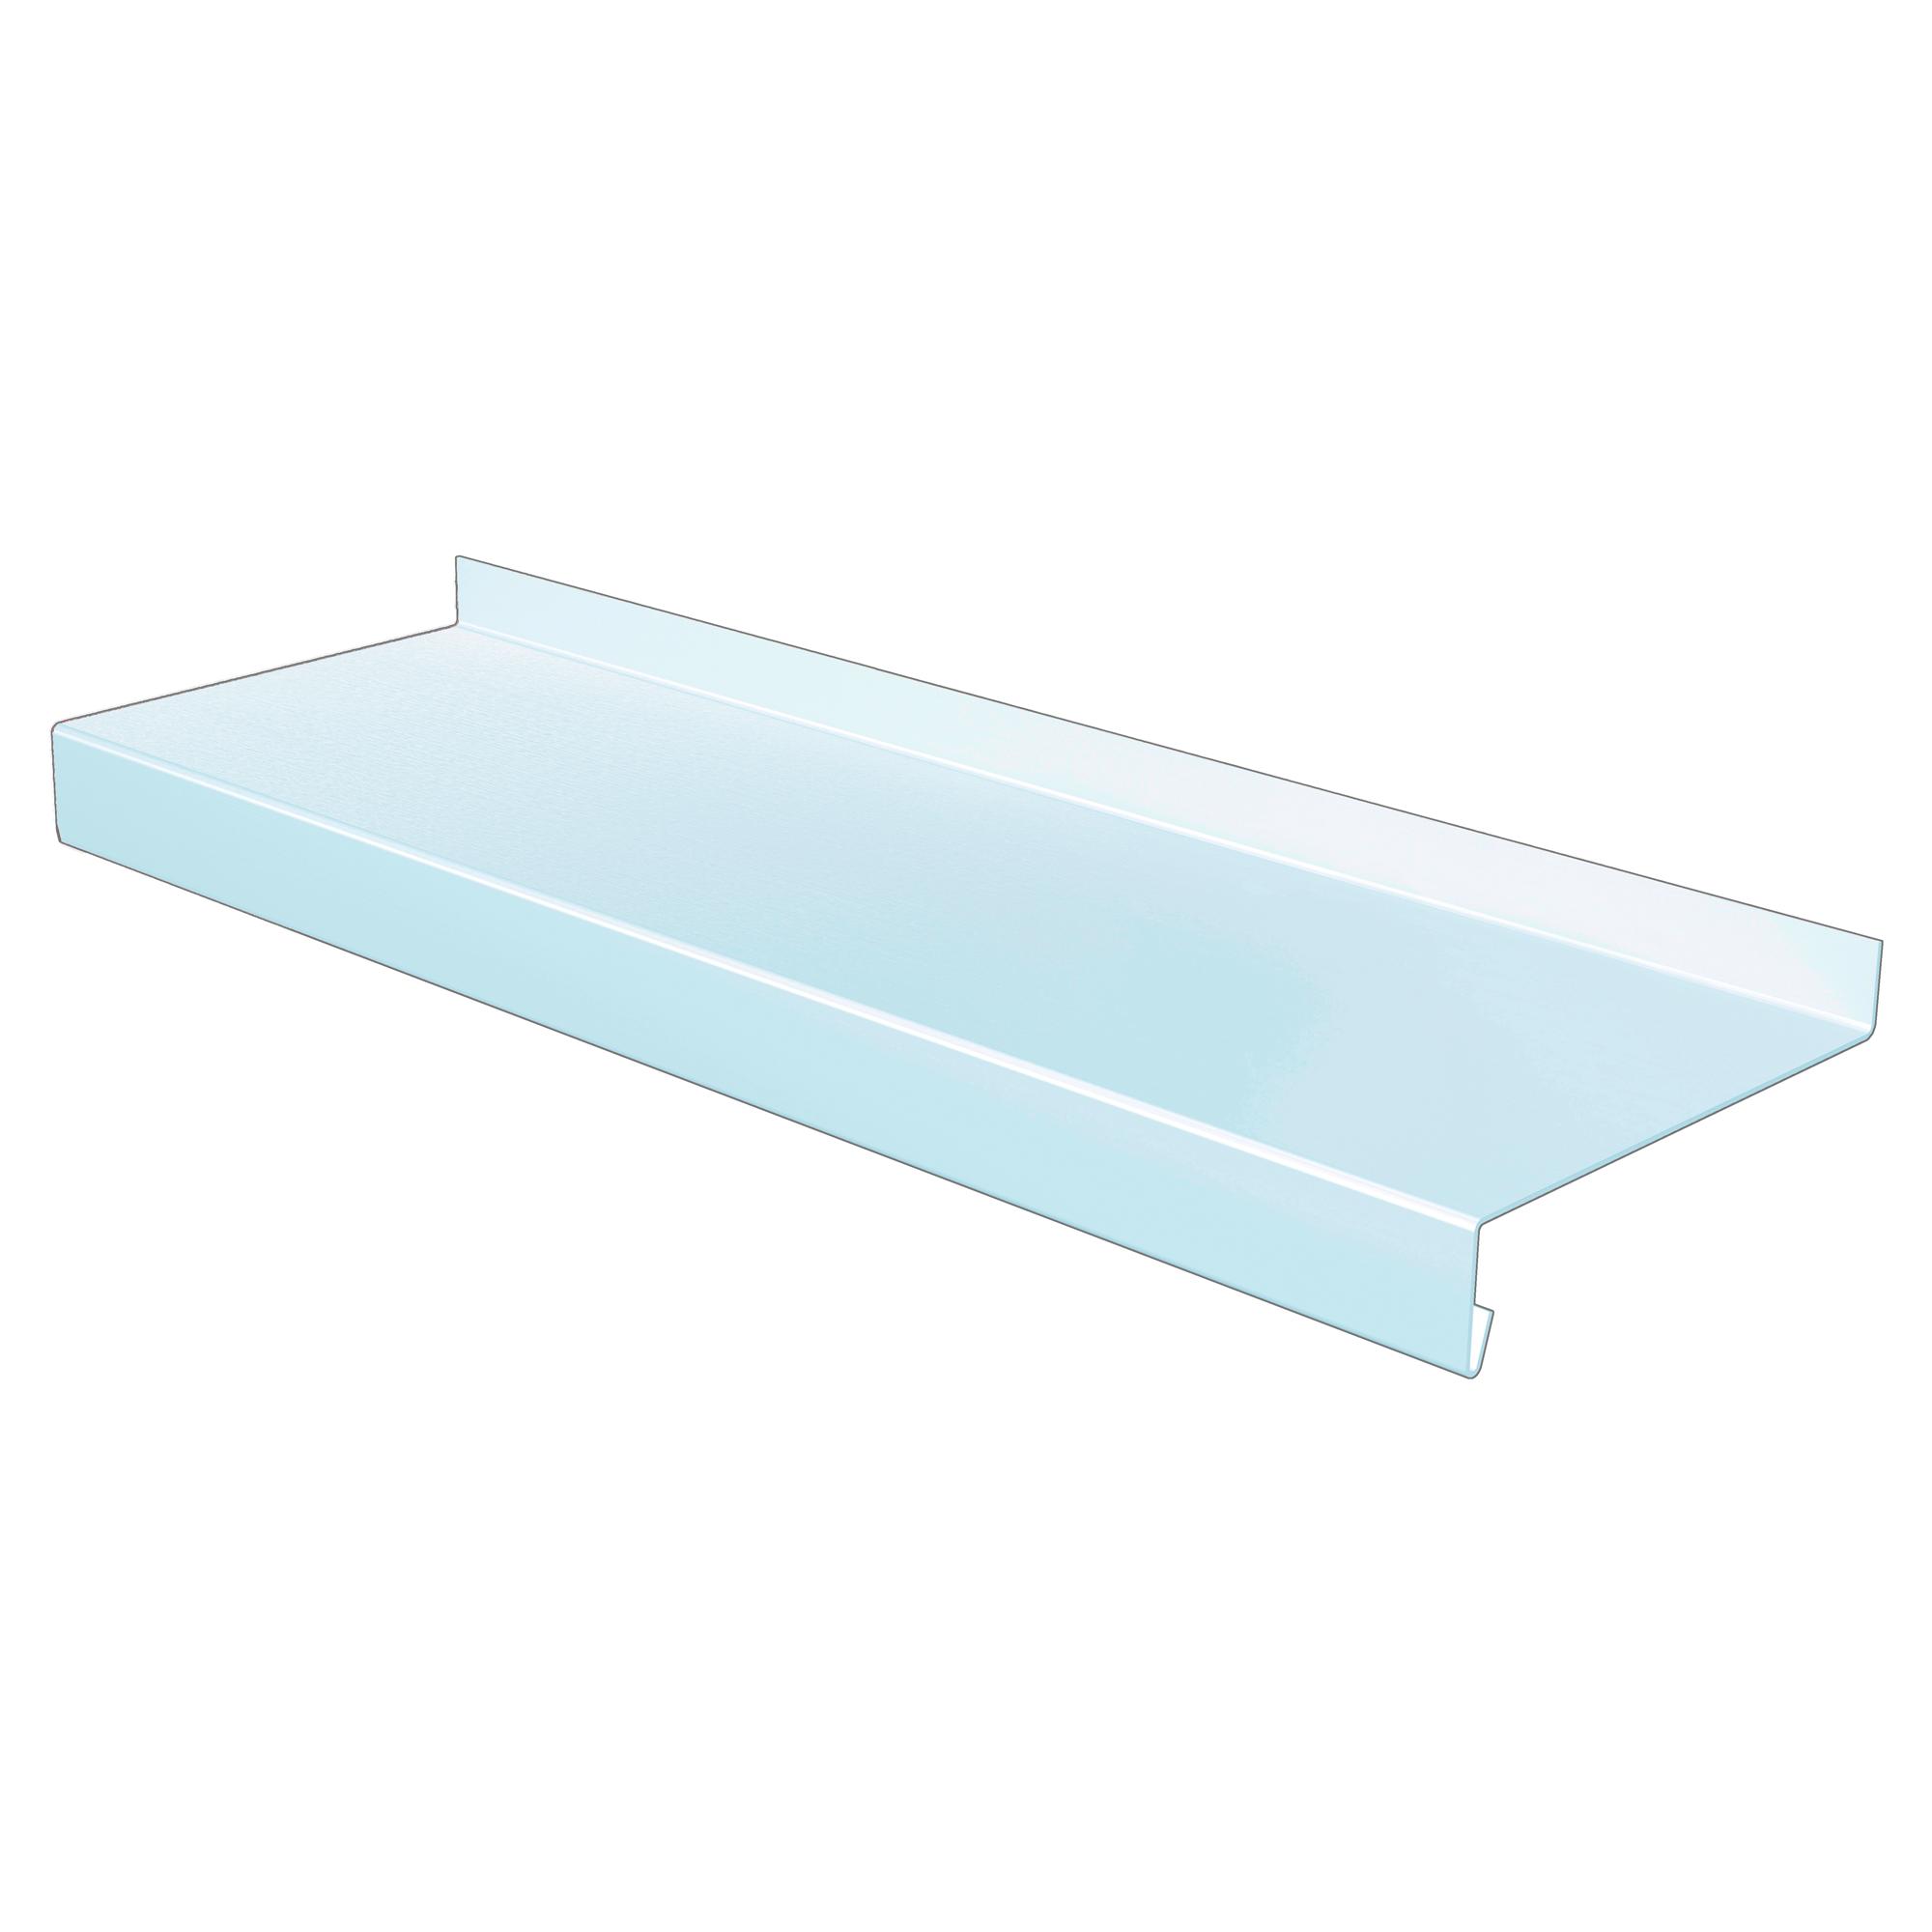 fensterbank aluminium wei 300 x 0 15 x 13 cm toom baumarkt. Black Bedroom Furniture Sets. Home Design Ideas